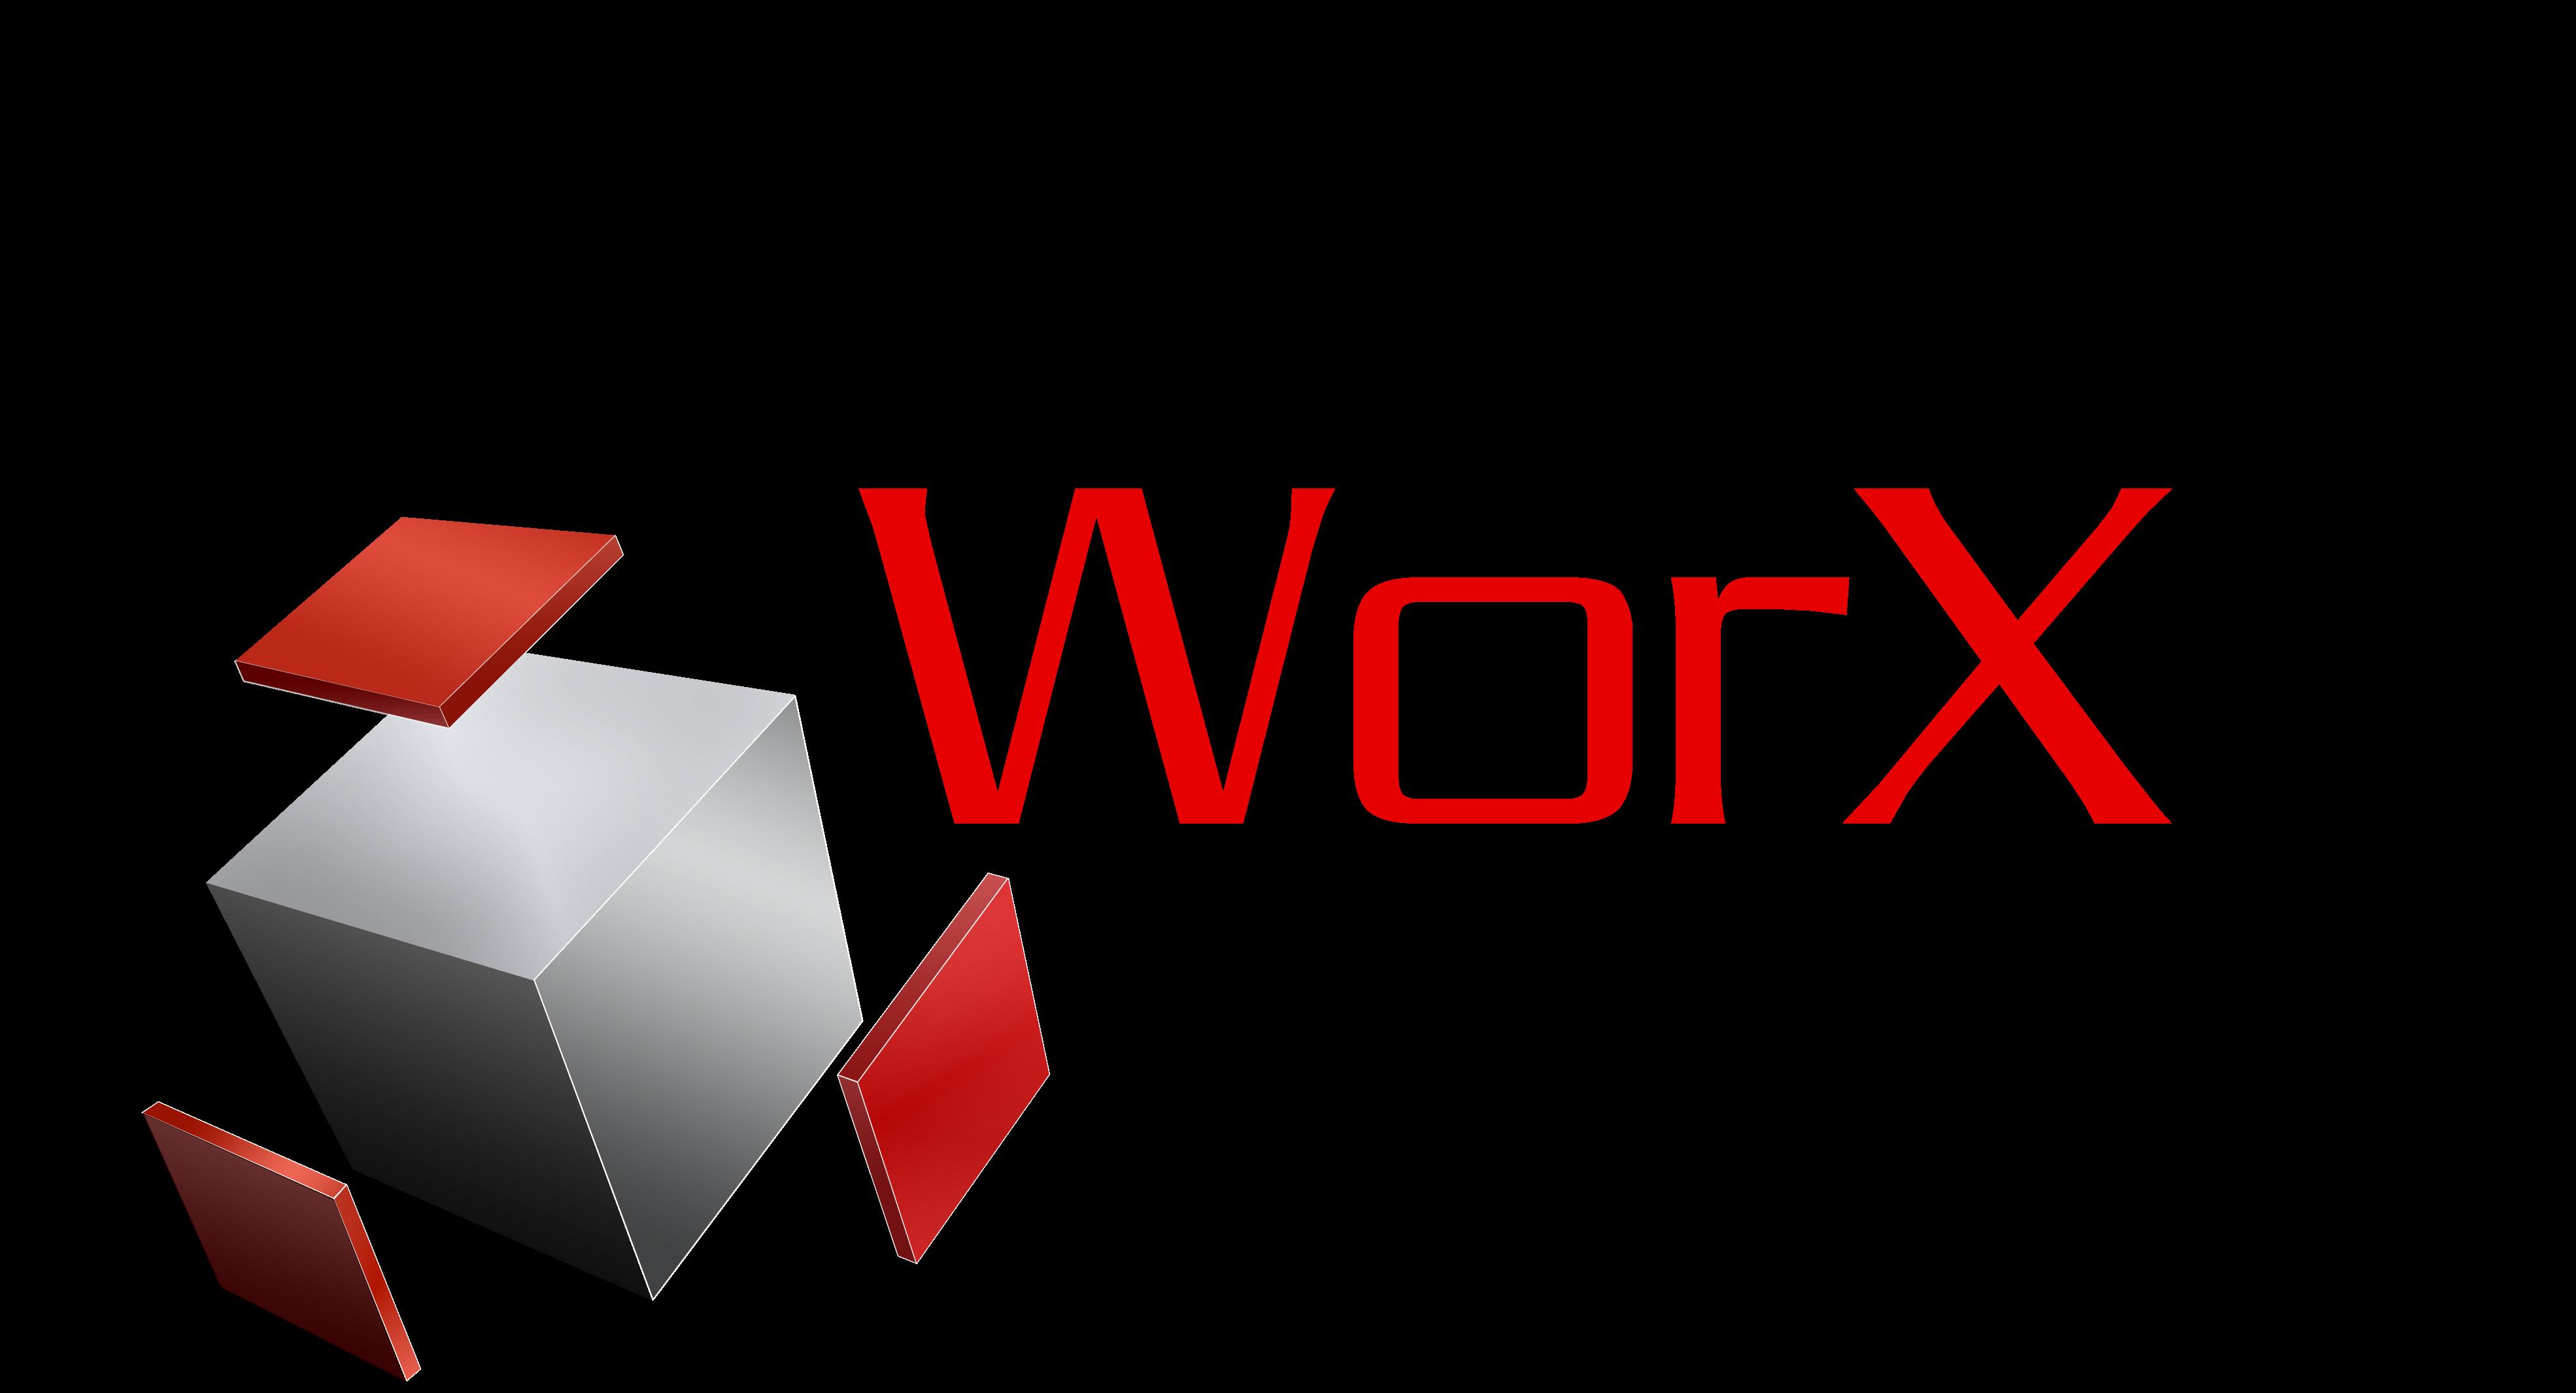 Electrician Worx